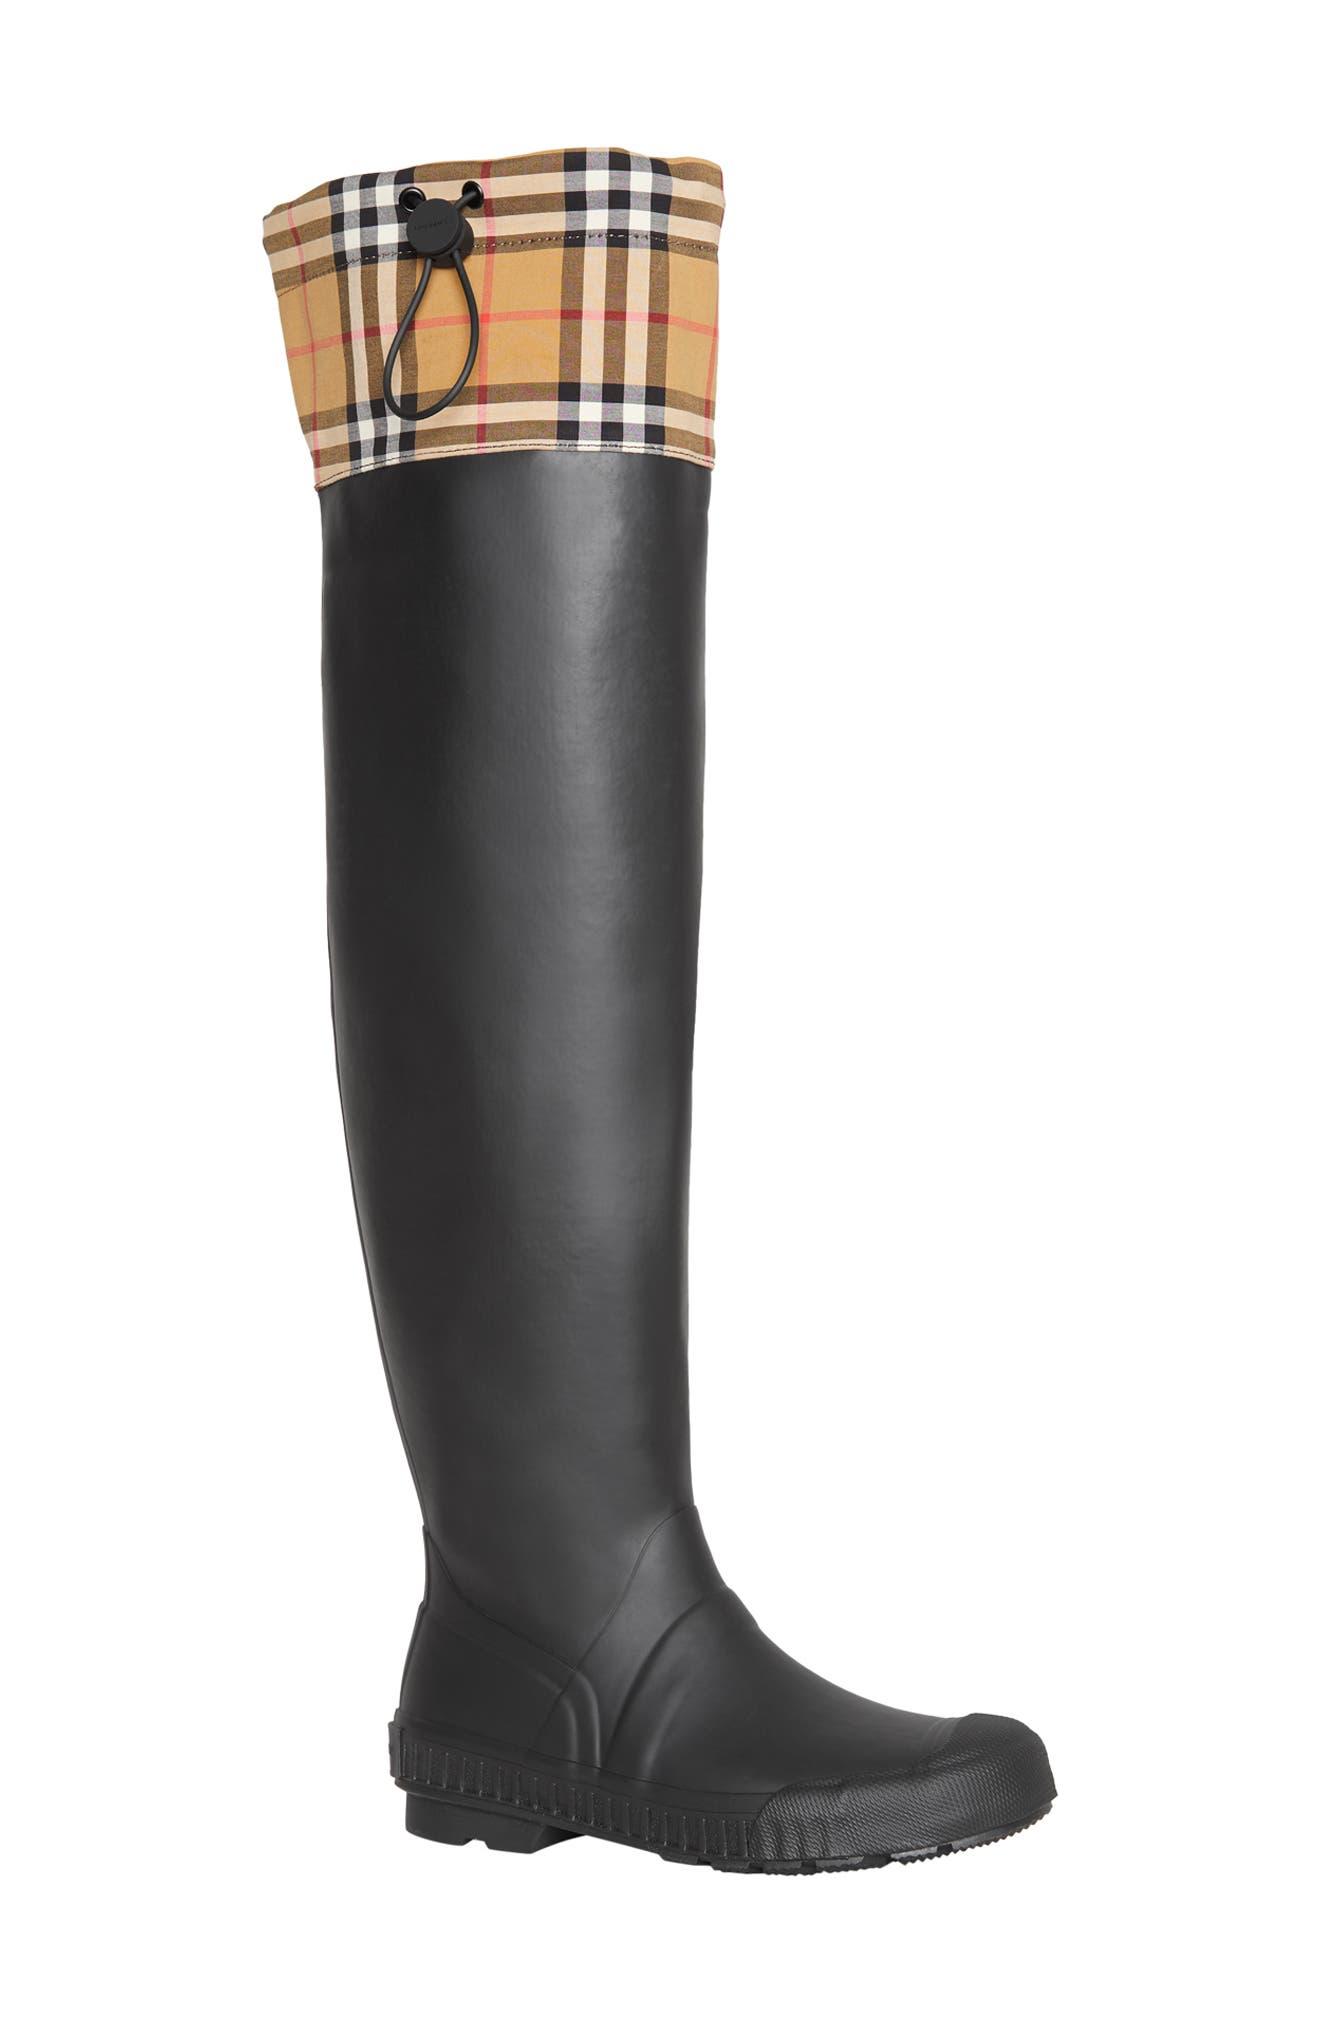 BURBERRY Freddie Tall Waterproof Rain Boot, Main, color, BLACK